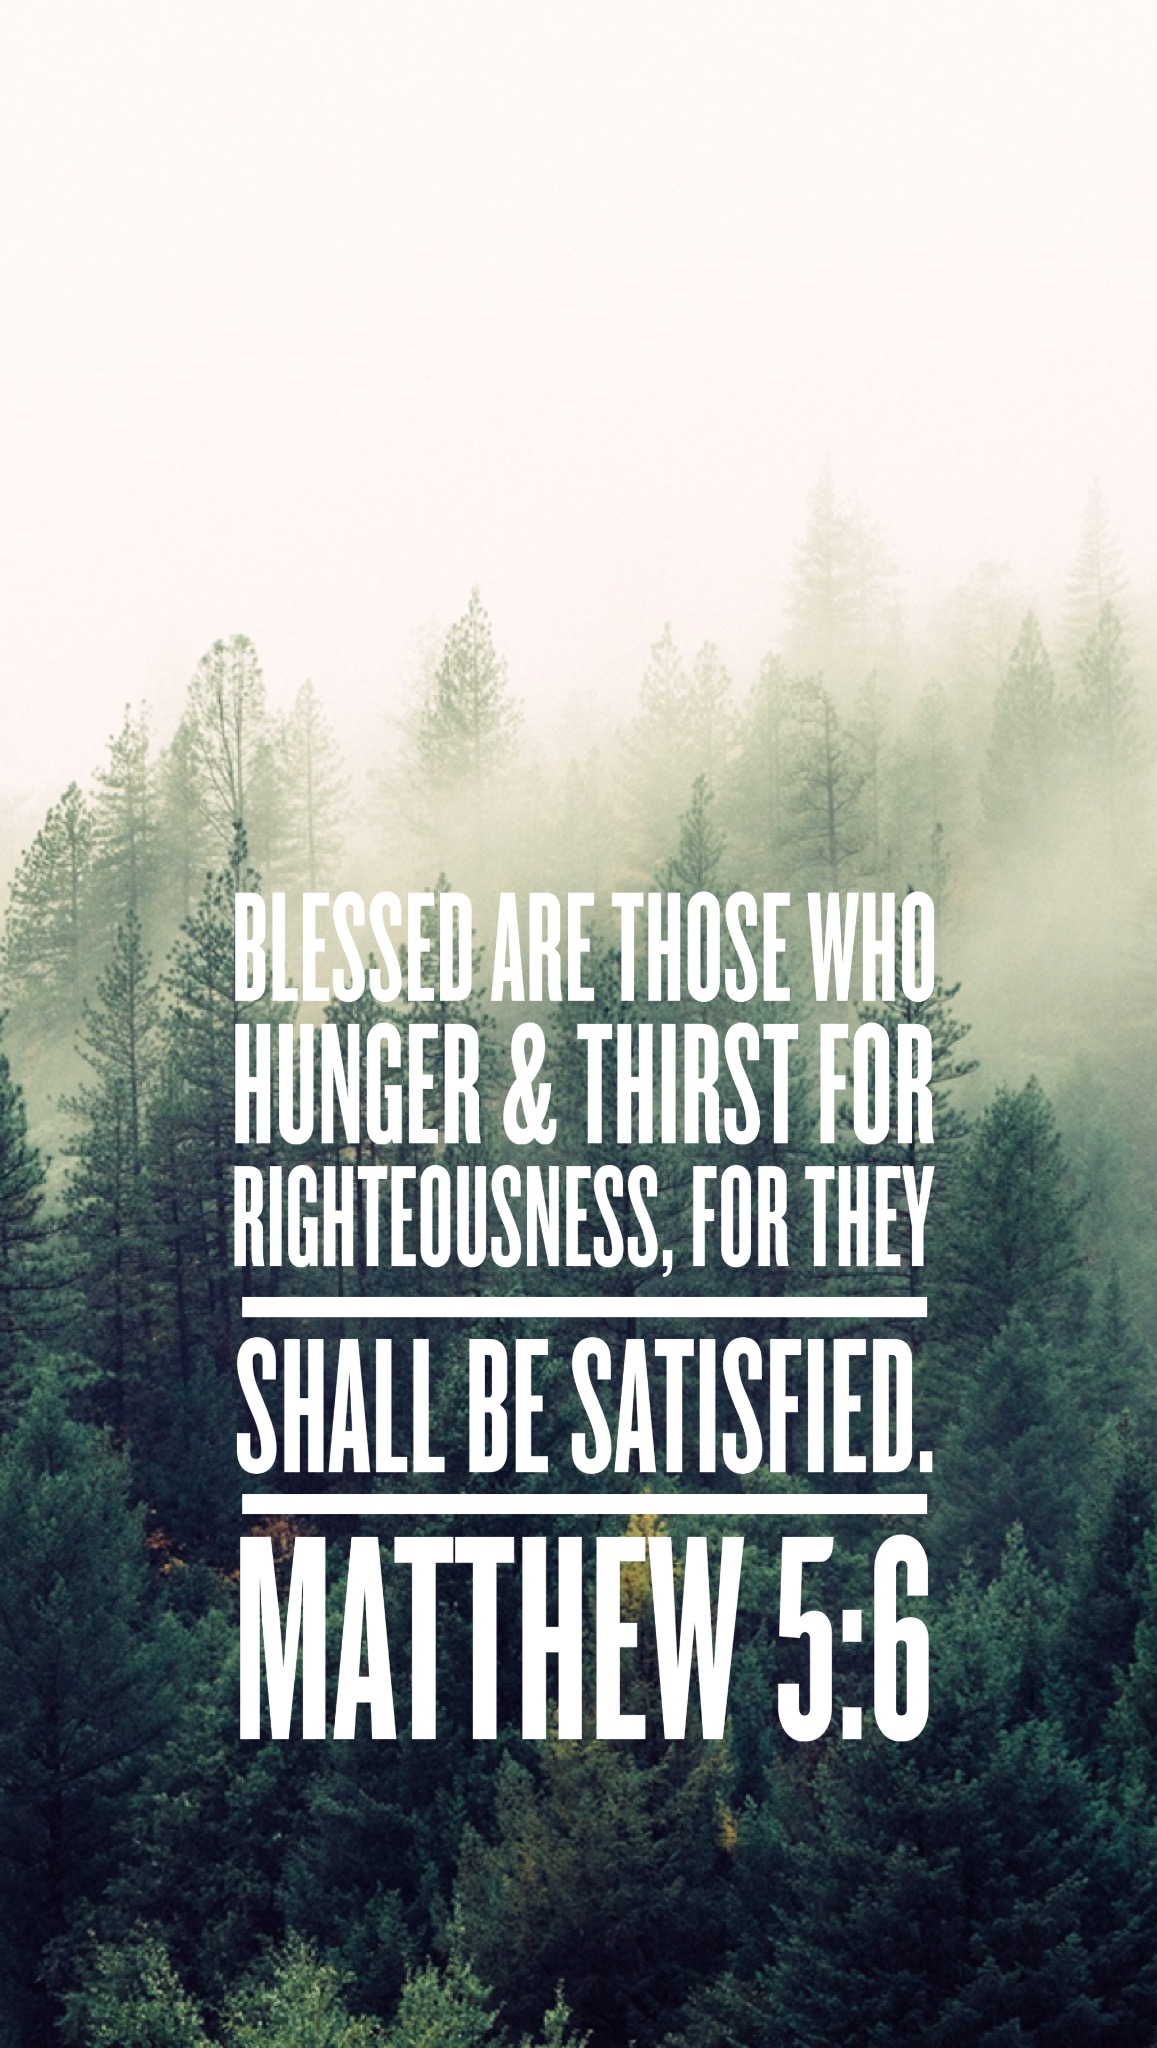 Matthew 5.6.JPG